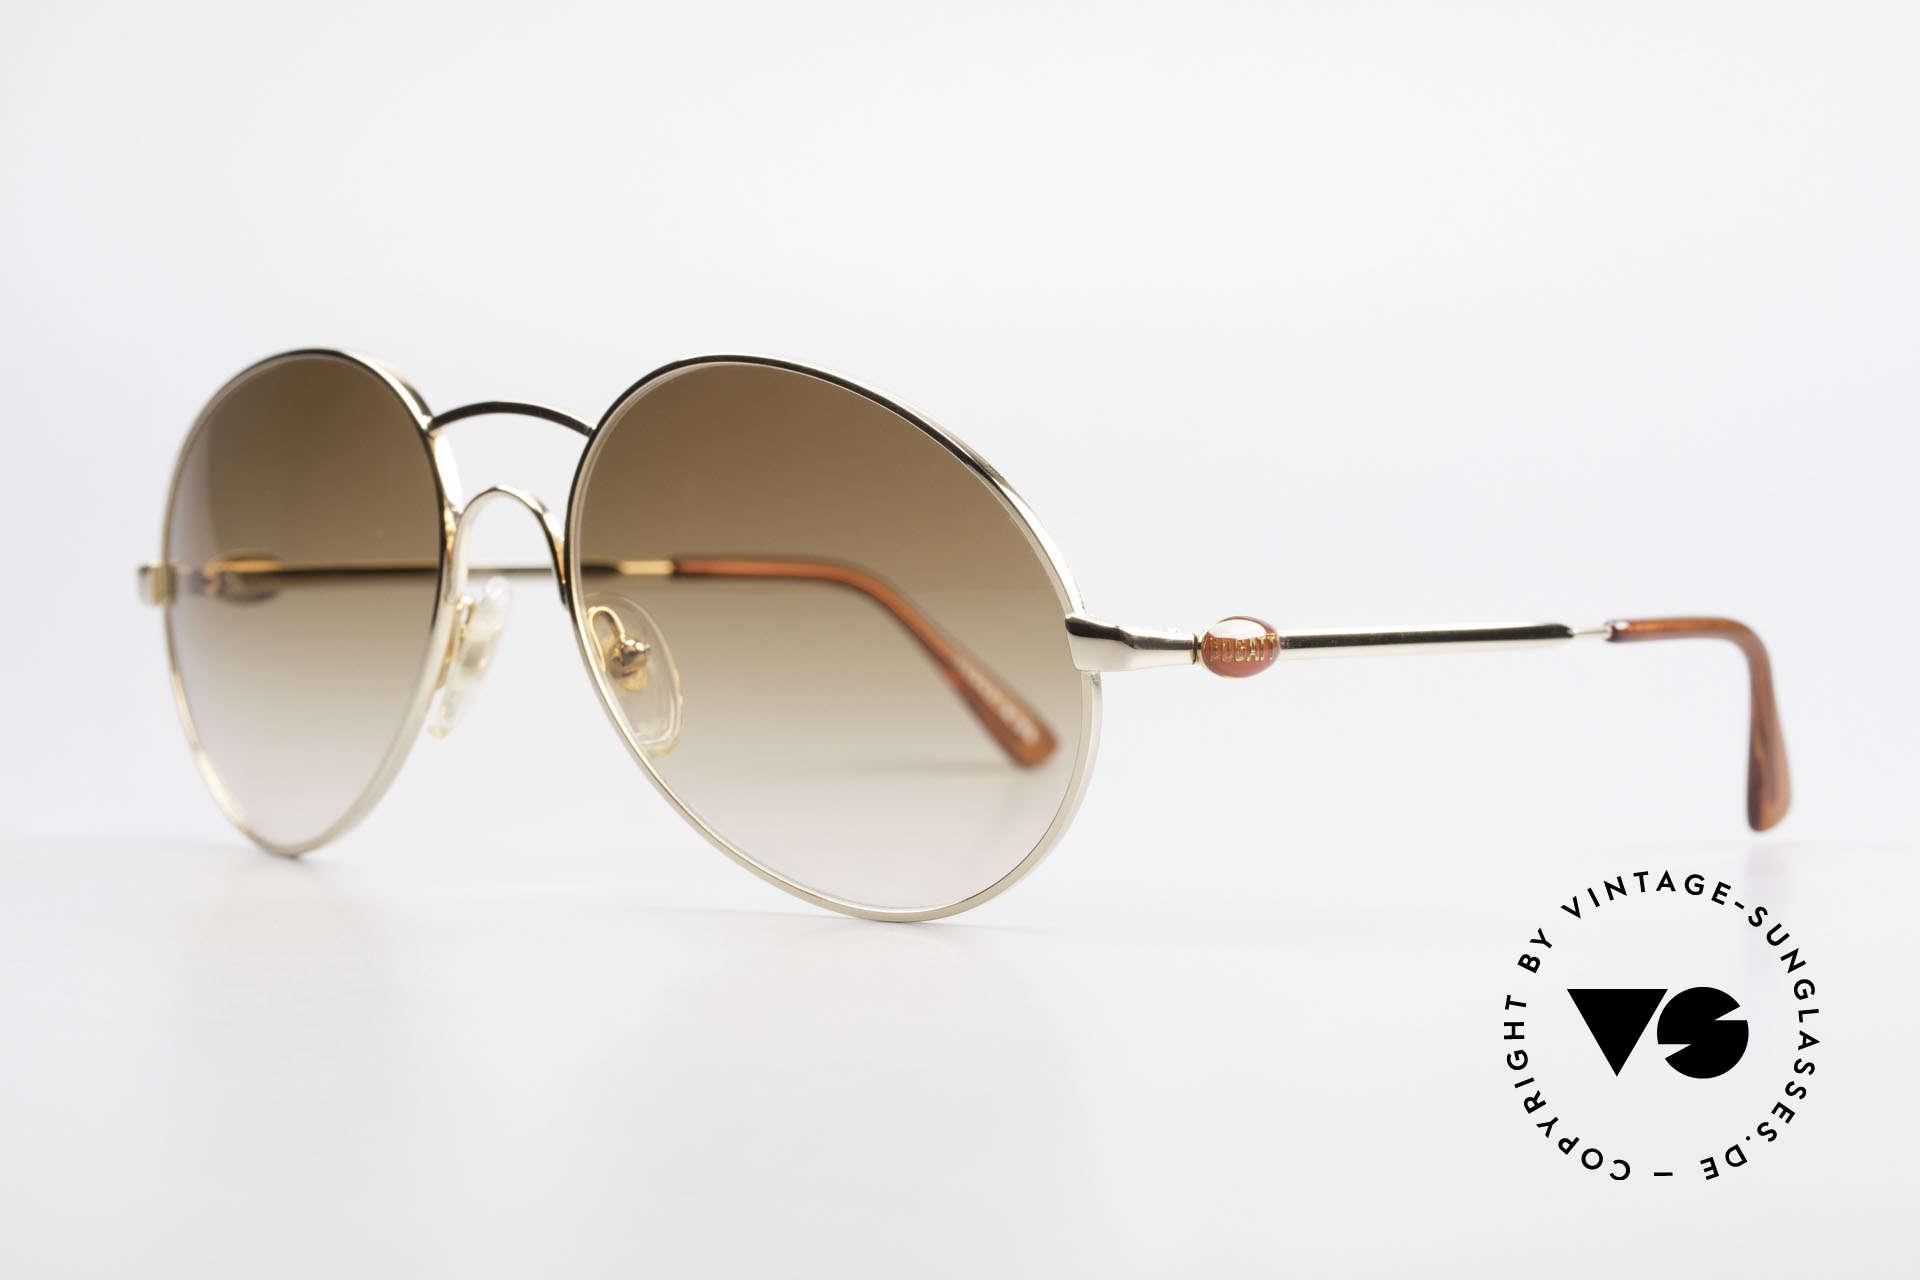 Bugatti 64947 Original 1980's XL Sunglasses, French premium craftsmanship; 100% UV protection, Made for Men